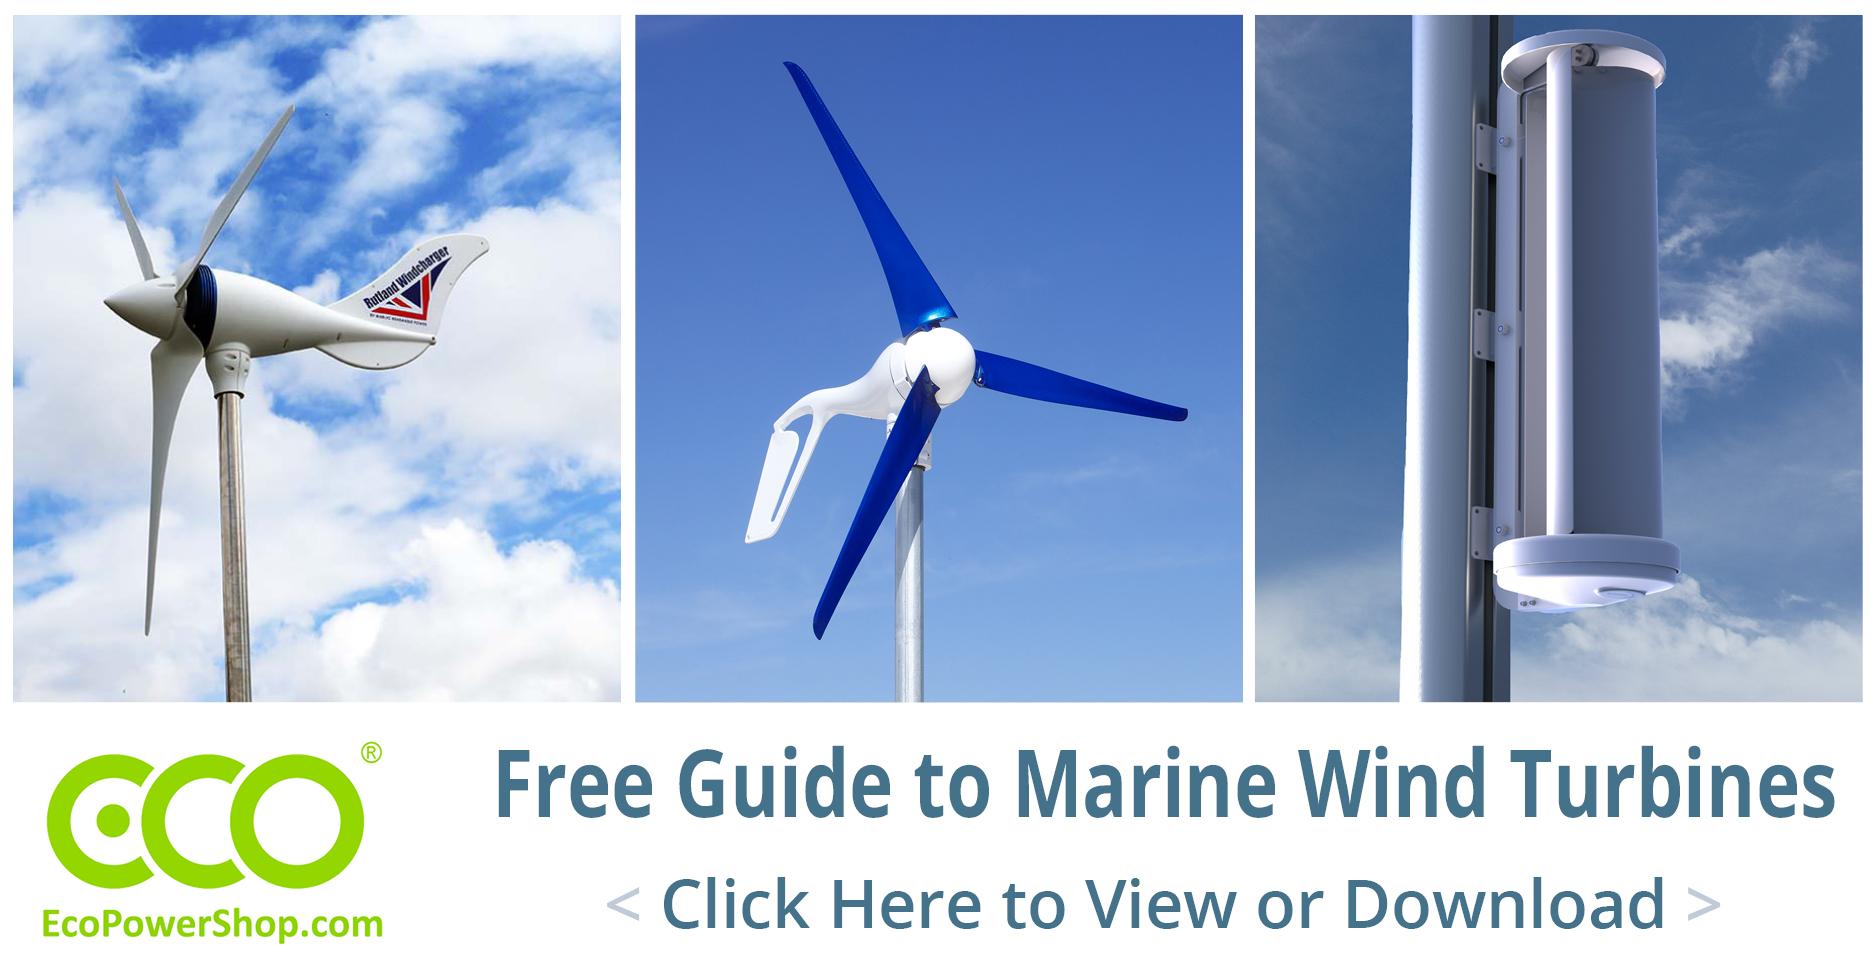 Marine Wind Turbine Guide